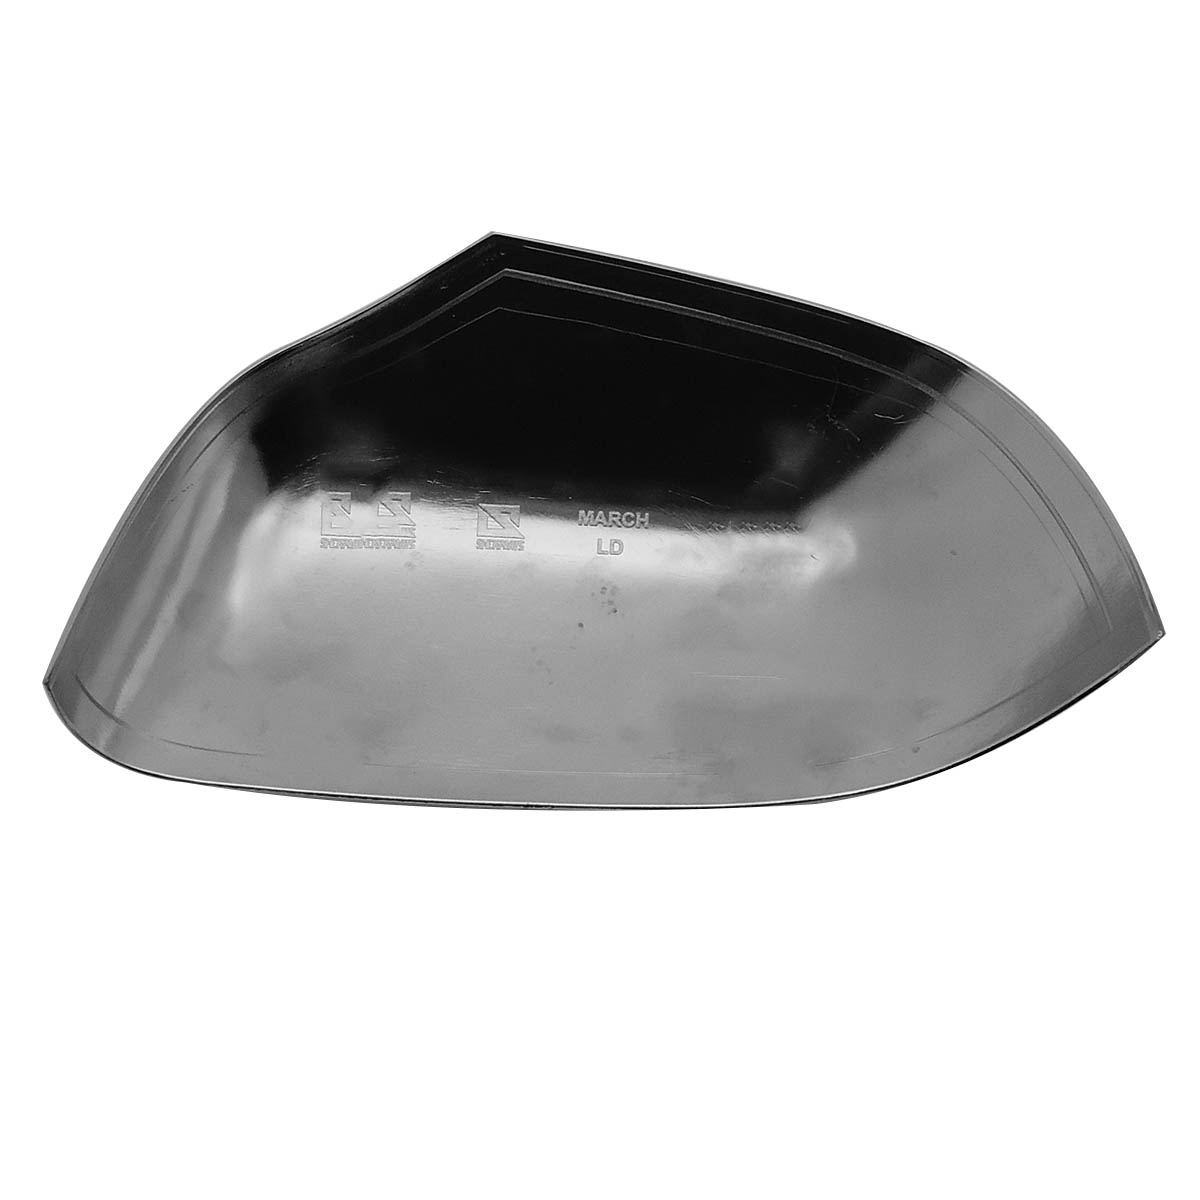 Capa de retrovisor cromada Duster 2012 a 2017 ou Duster Oroch 2016 2017